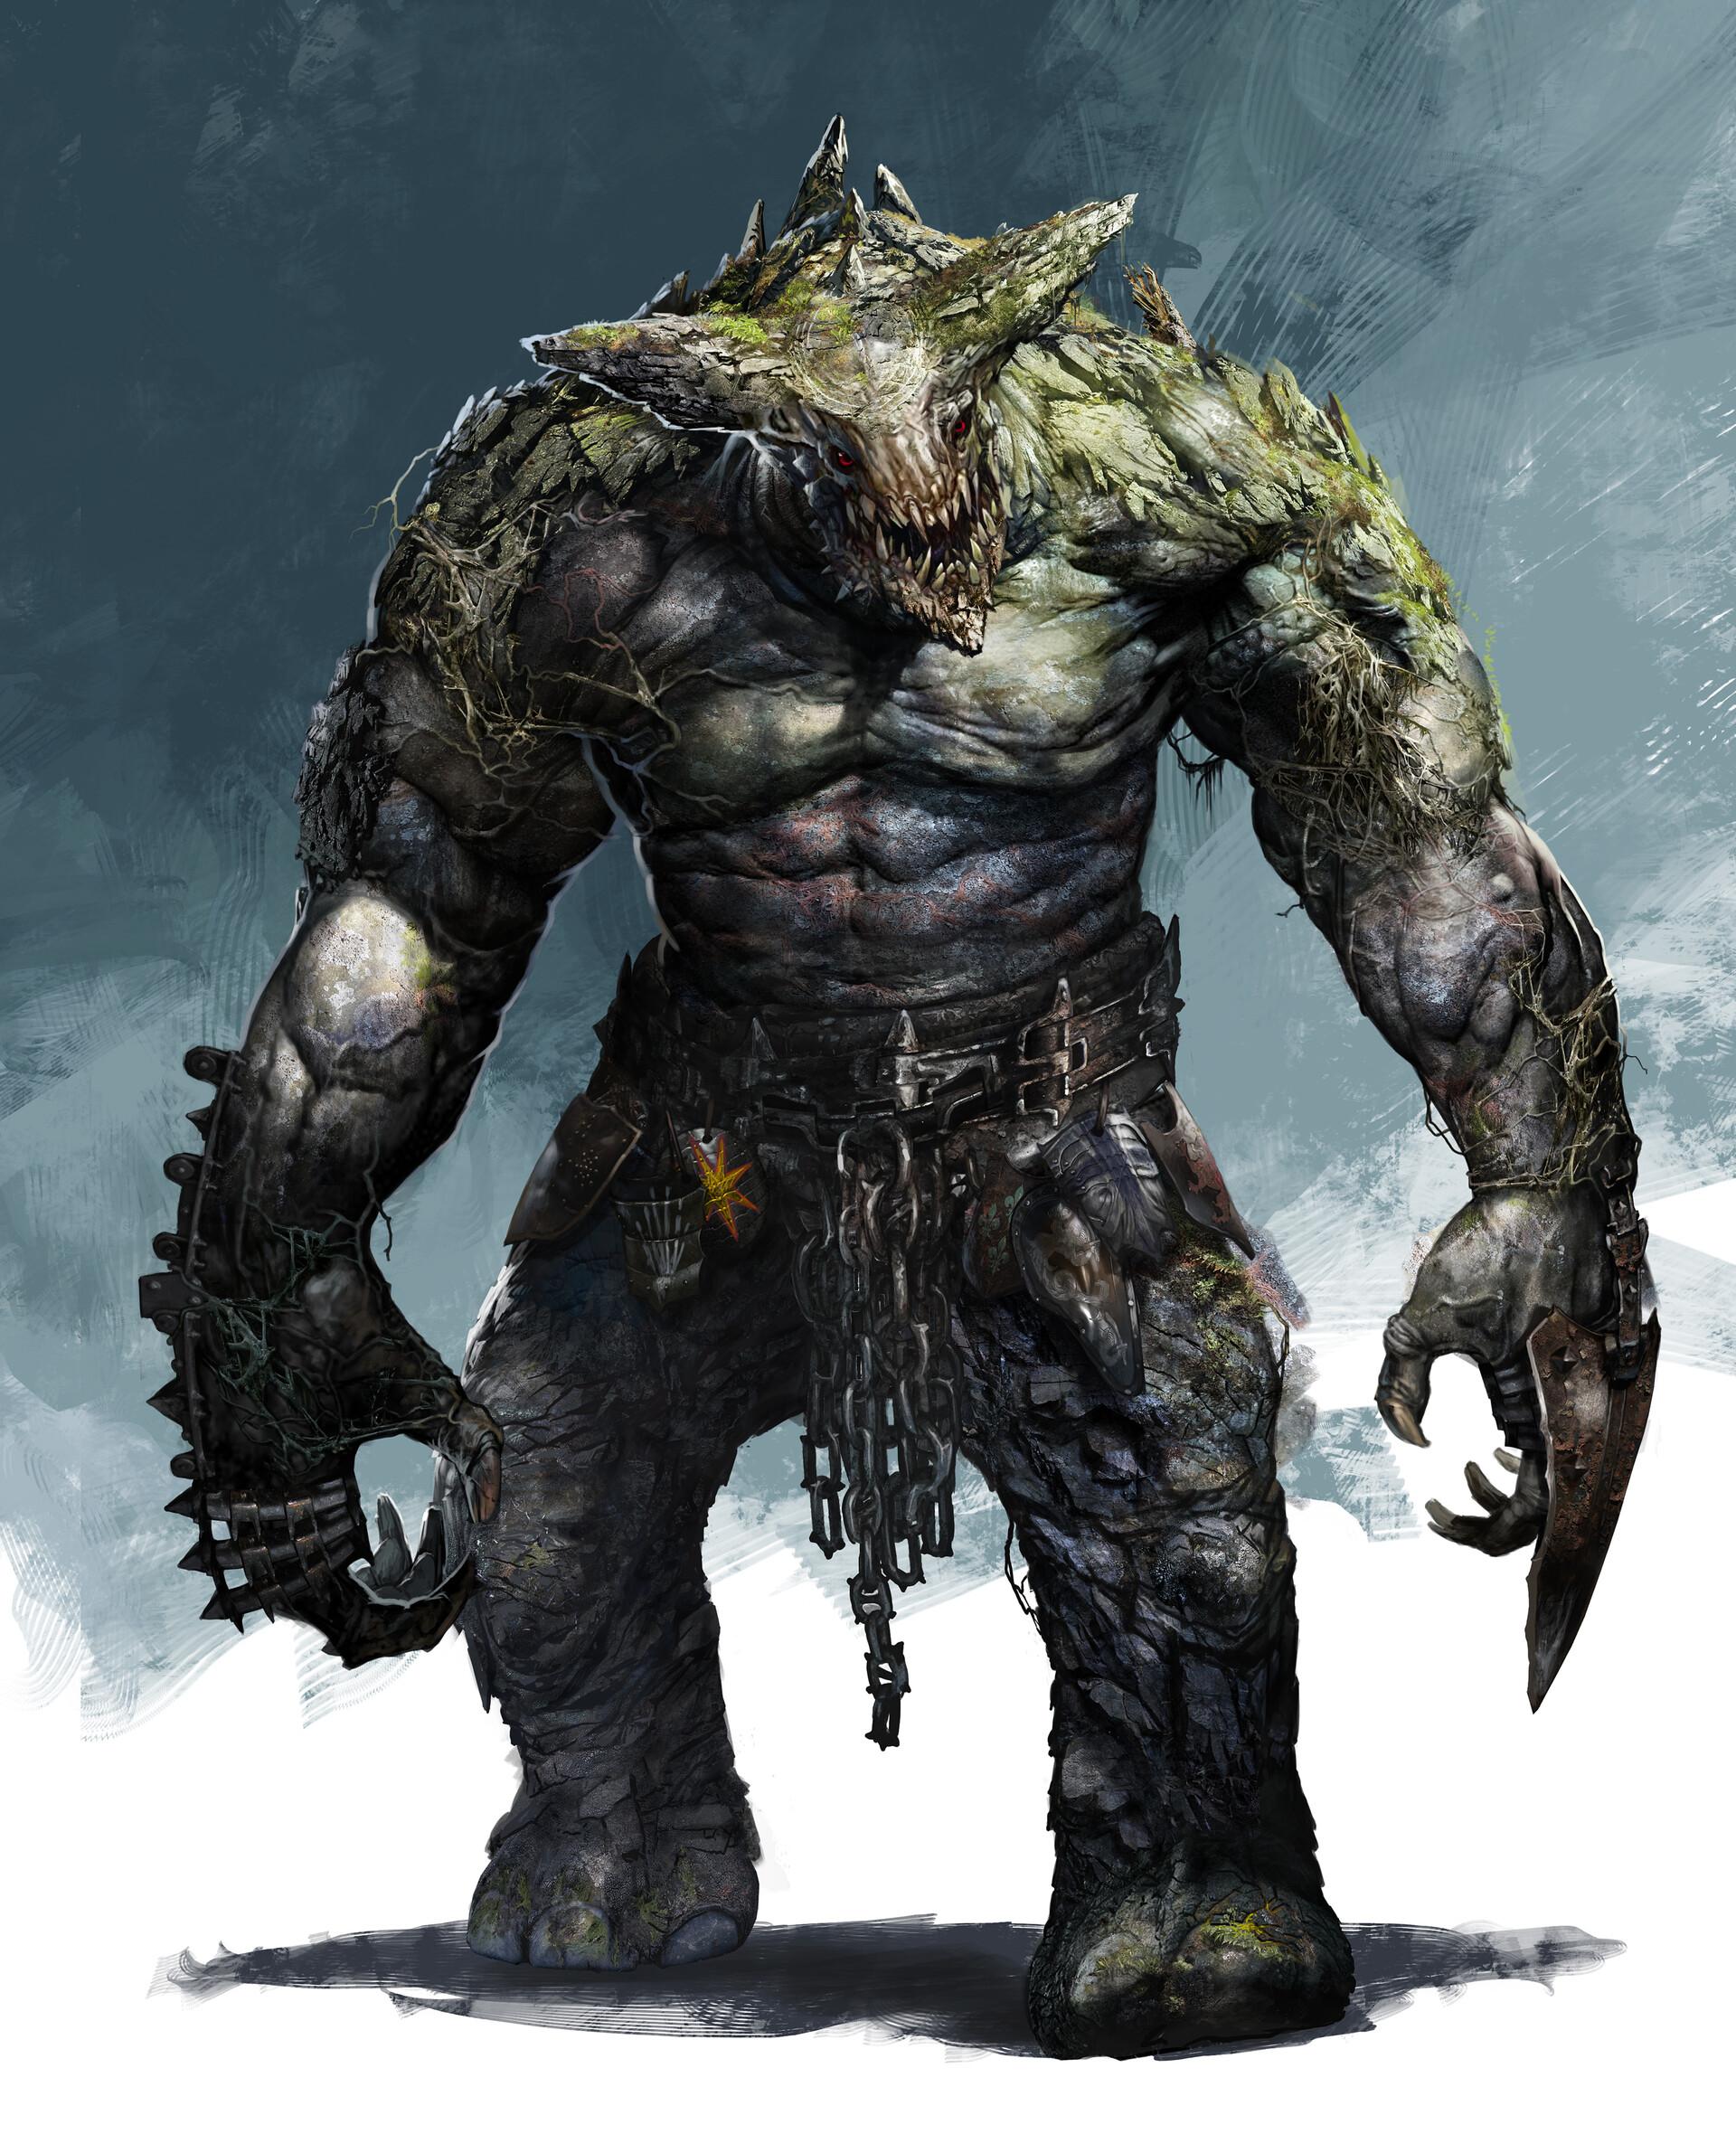 Jakub kuzma stone troll 5s